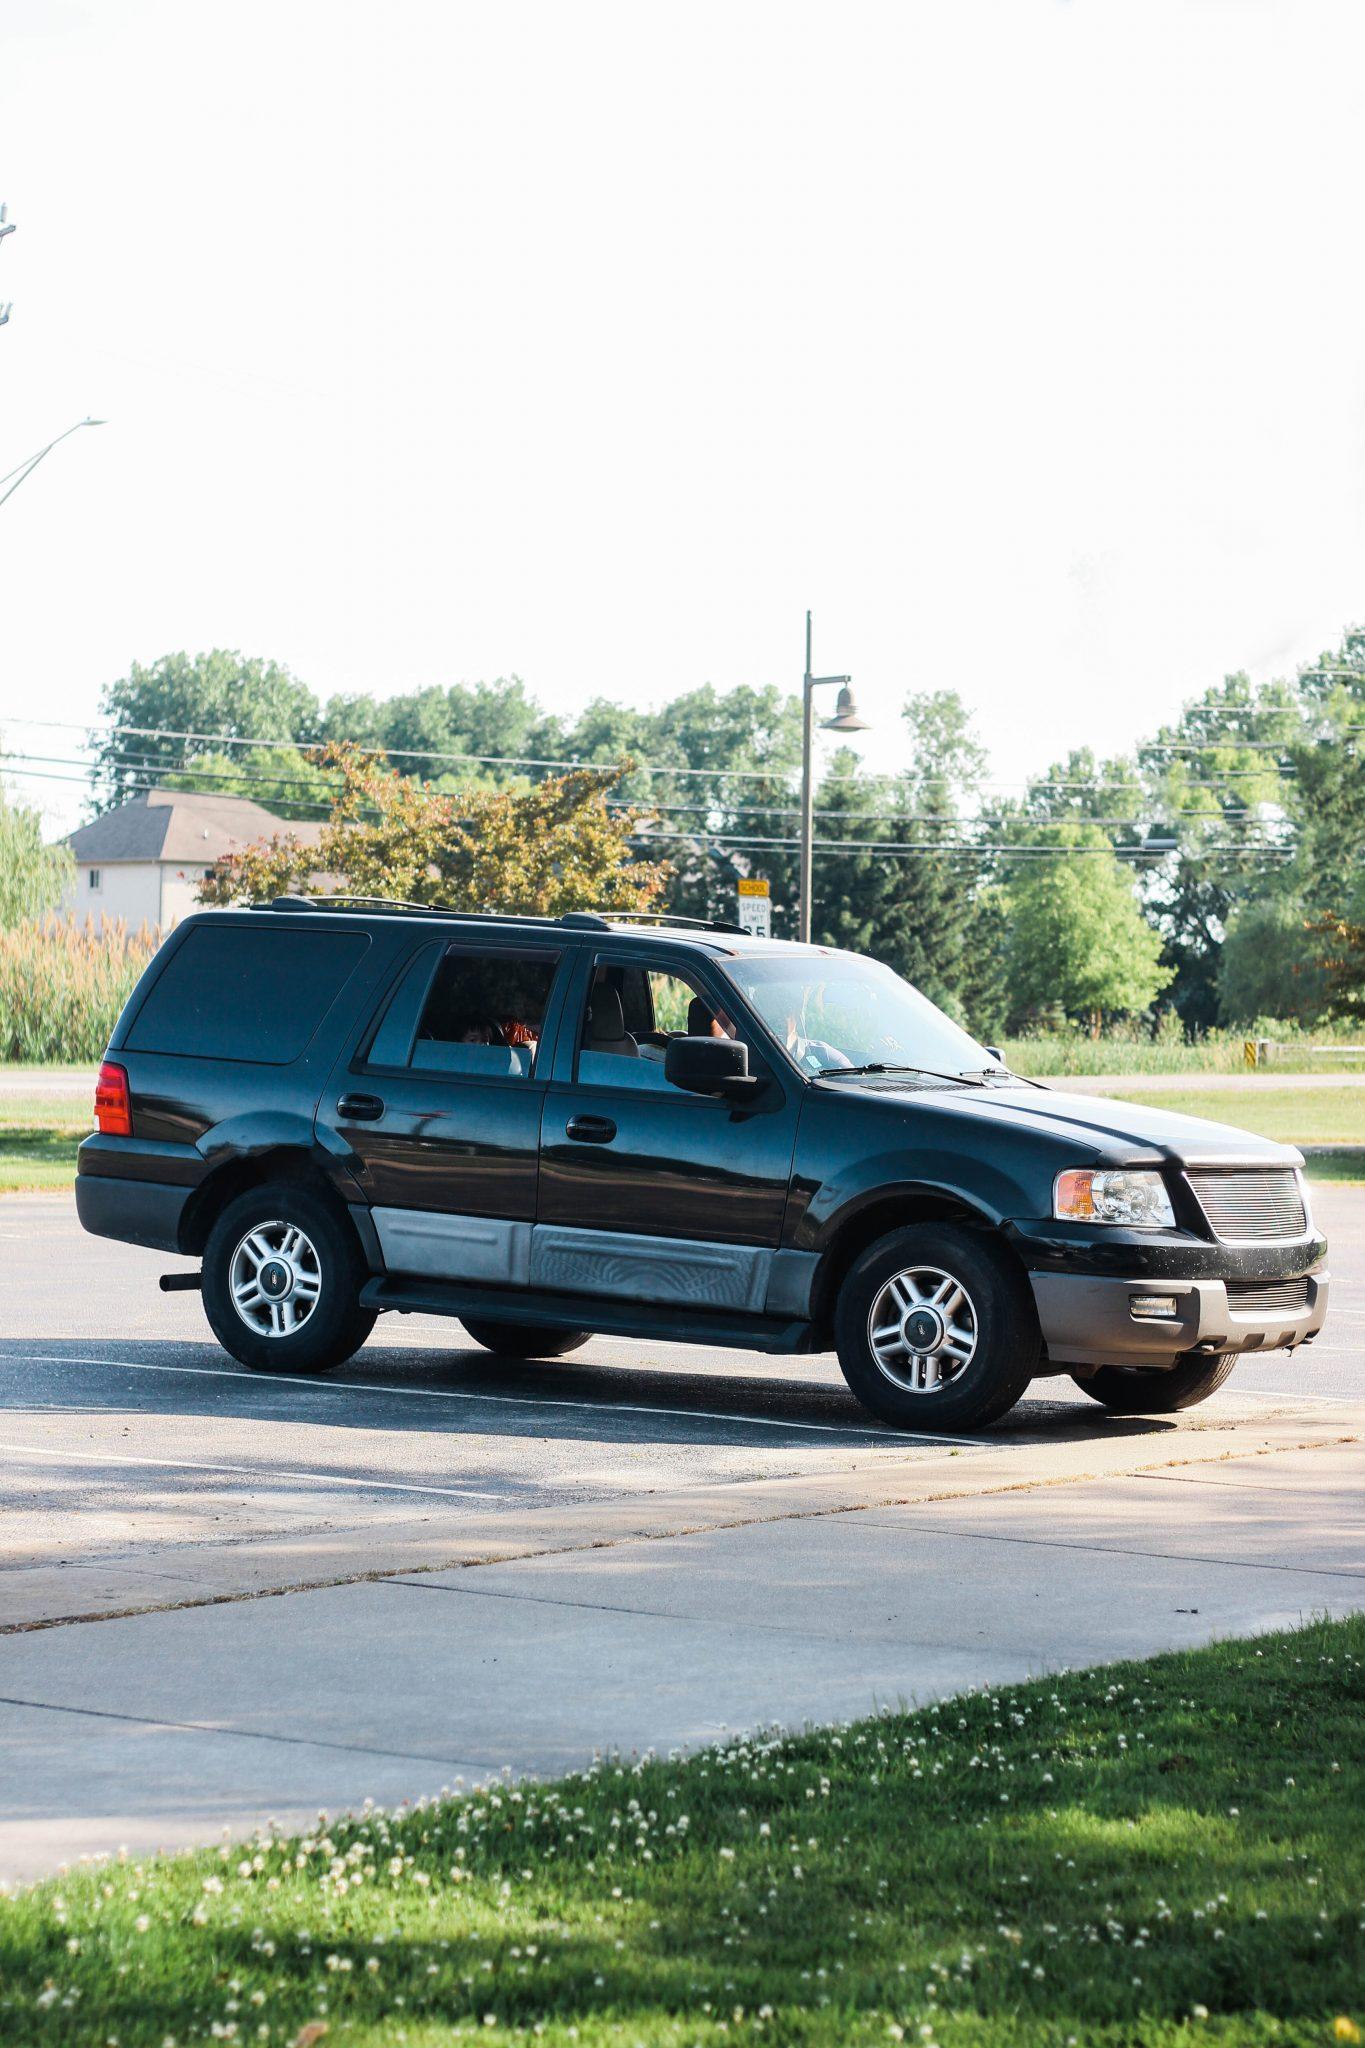 Family Car Pros Cons: SUV Minivan